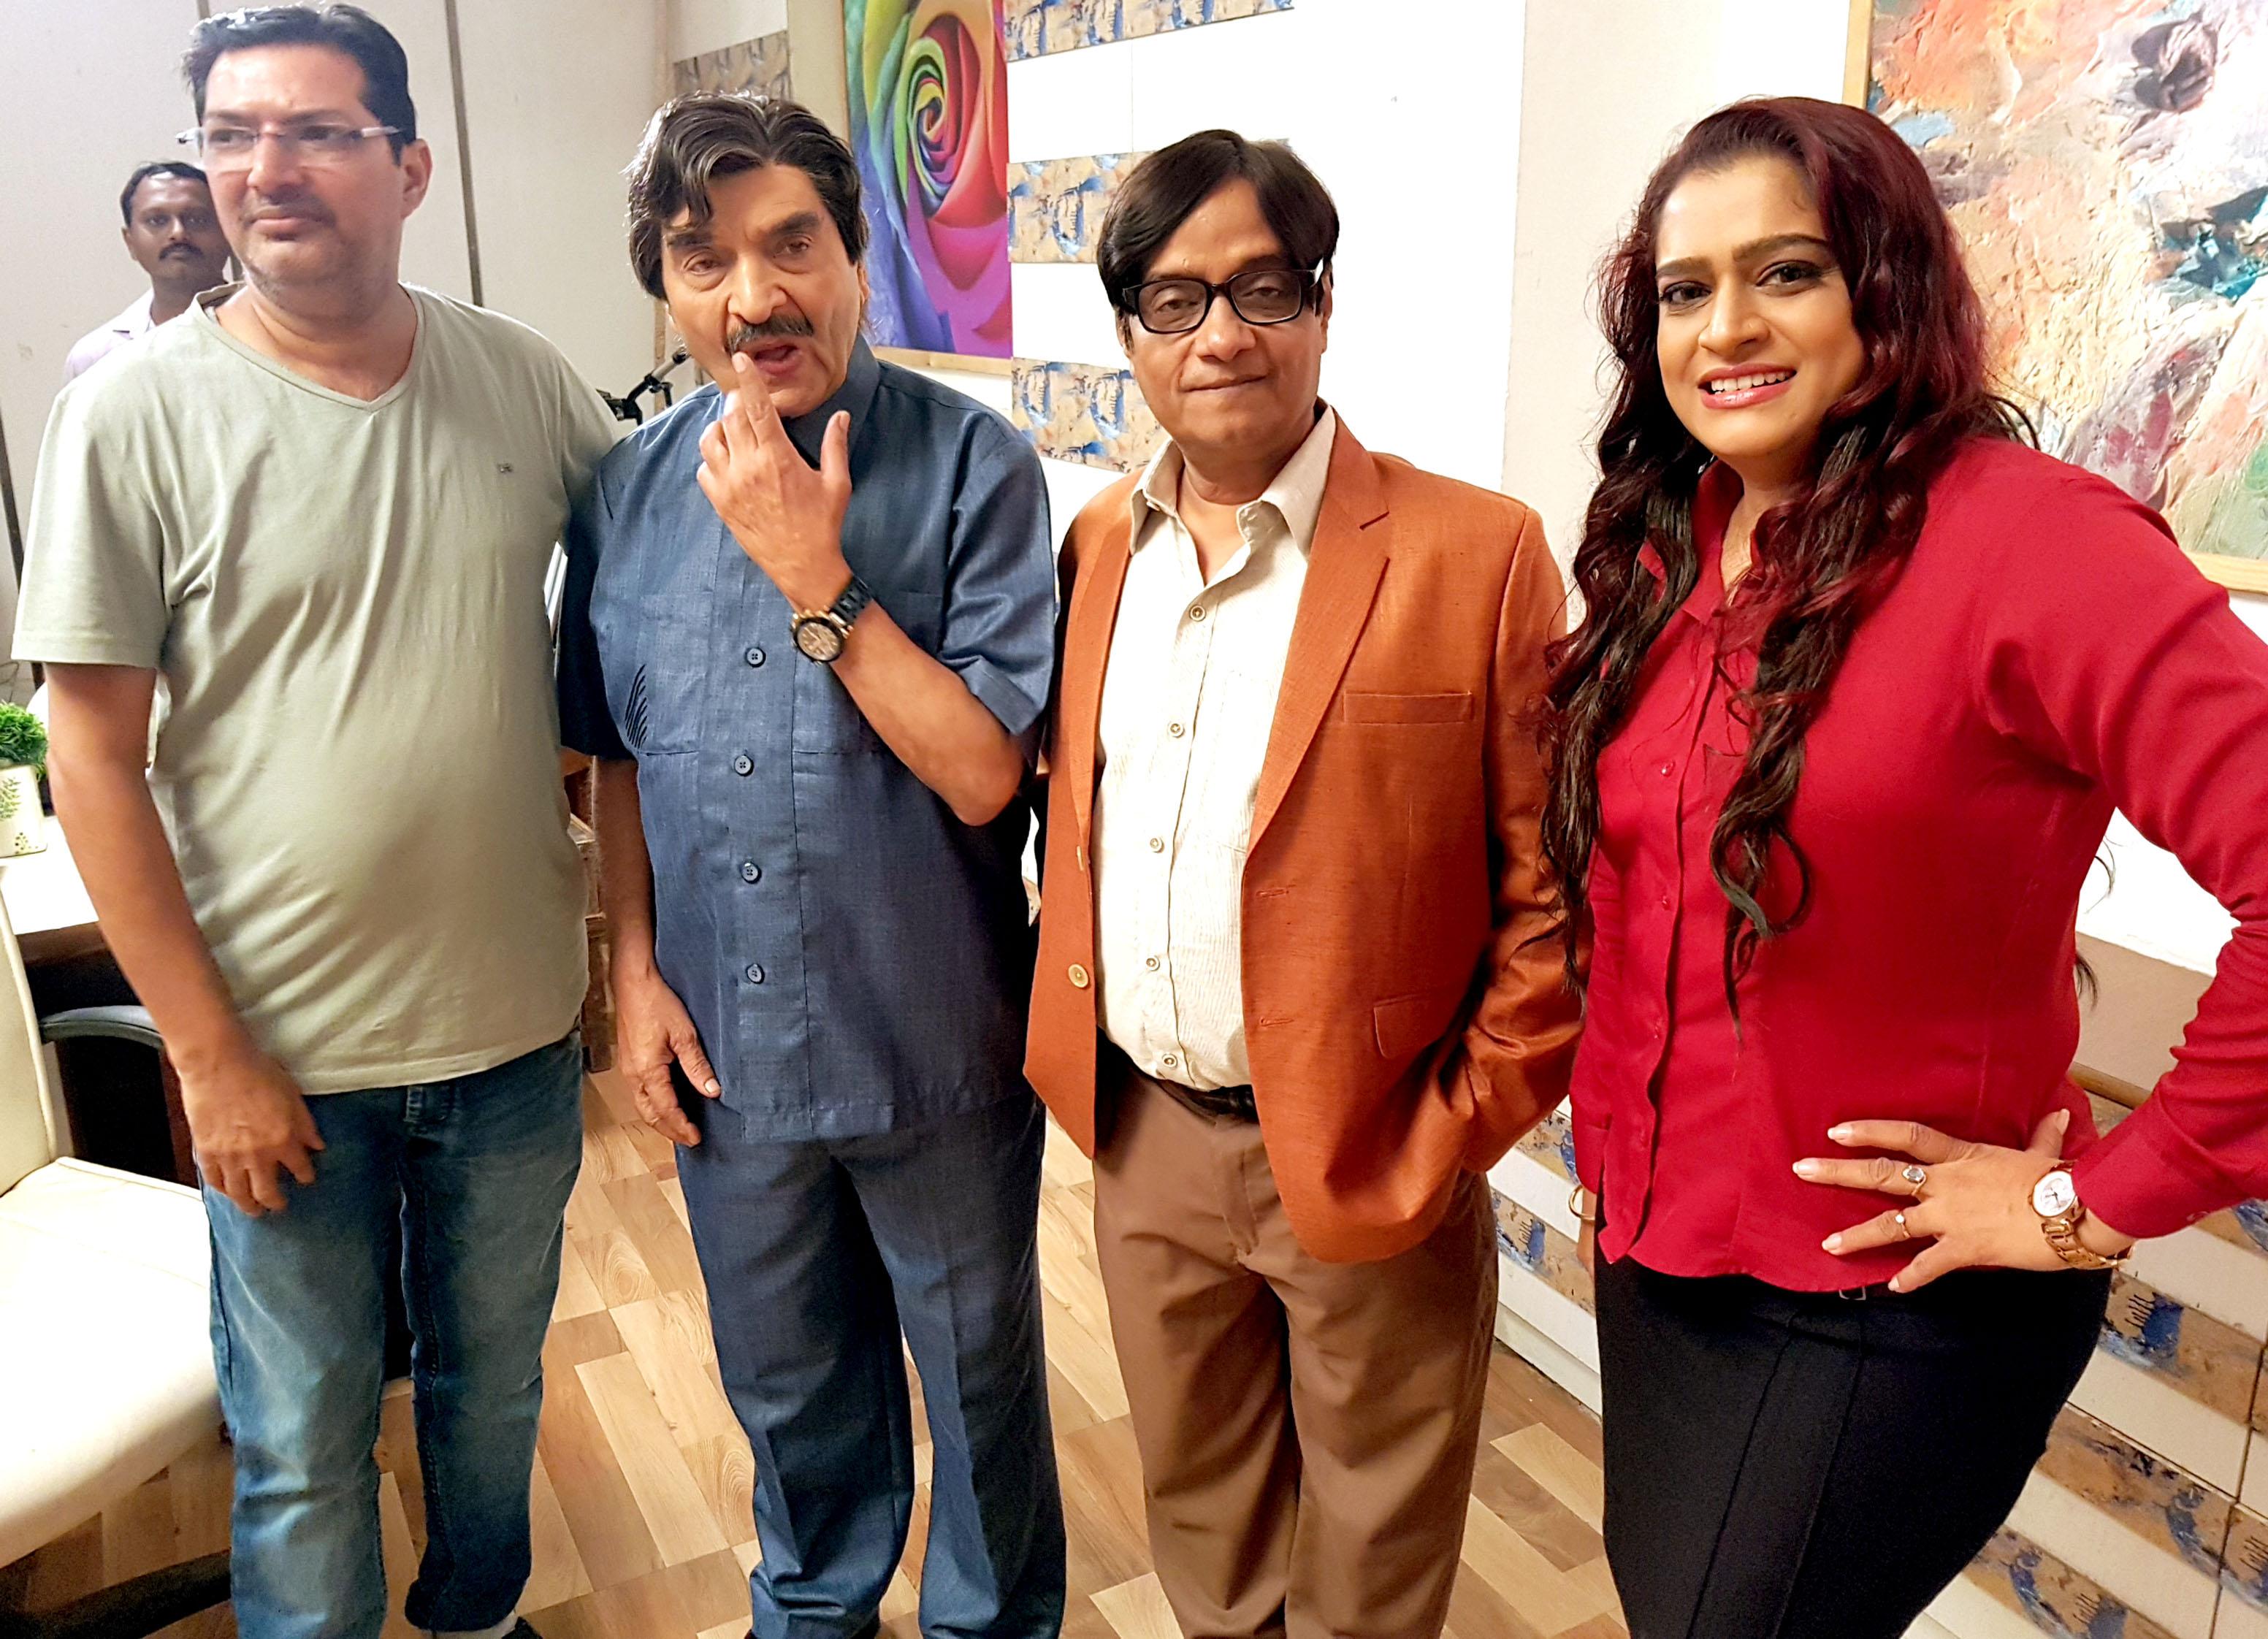 Ekta Jain to be part of comedy horror film Khalli Balli directed by Manoj Sharma